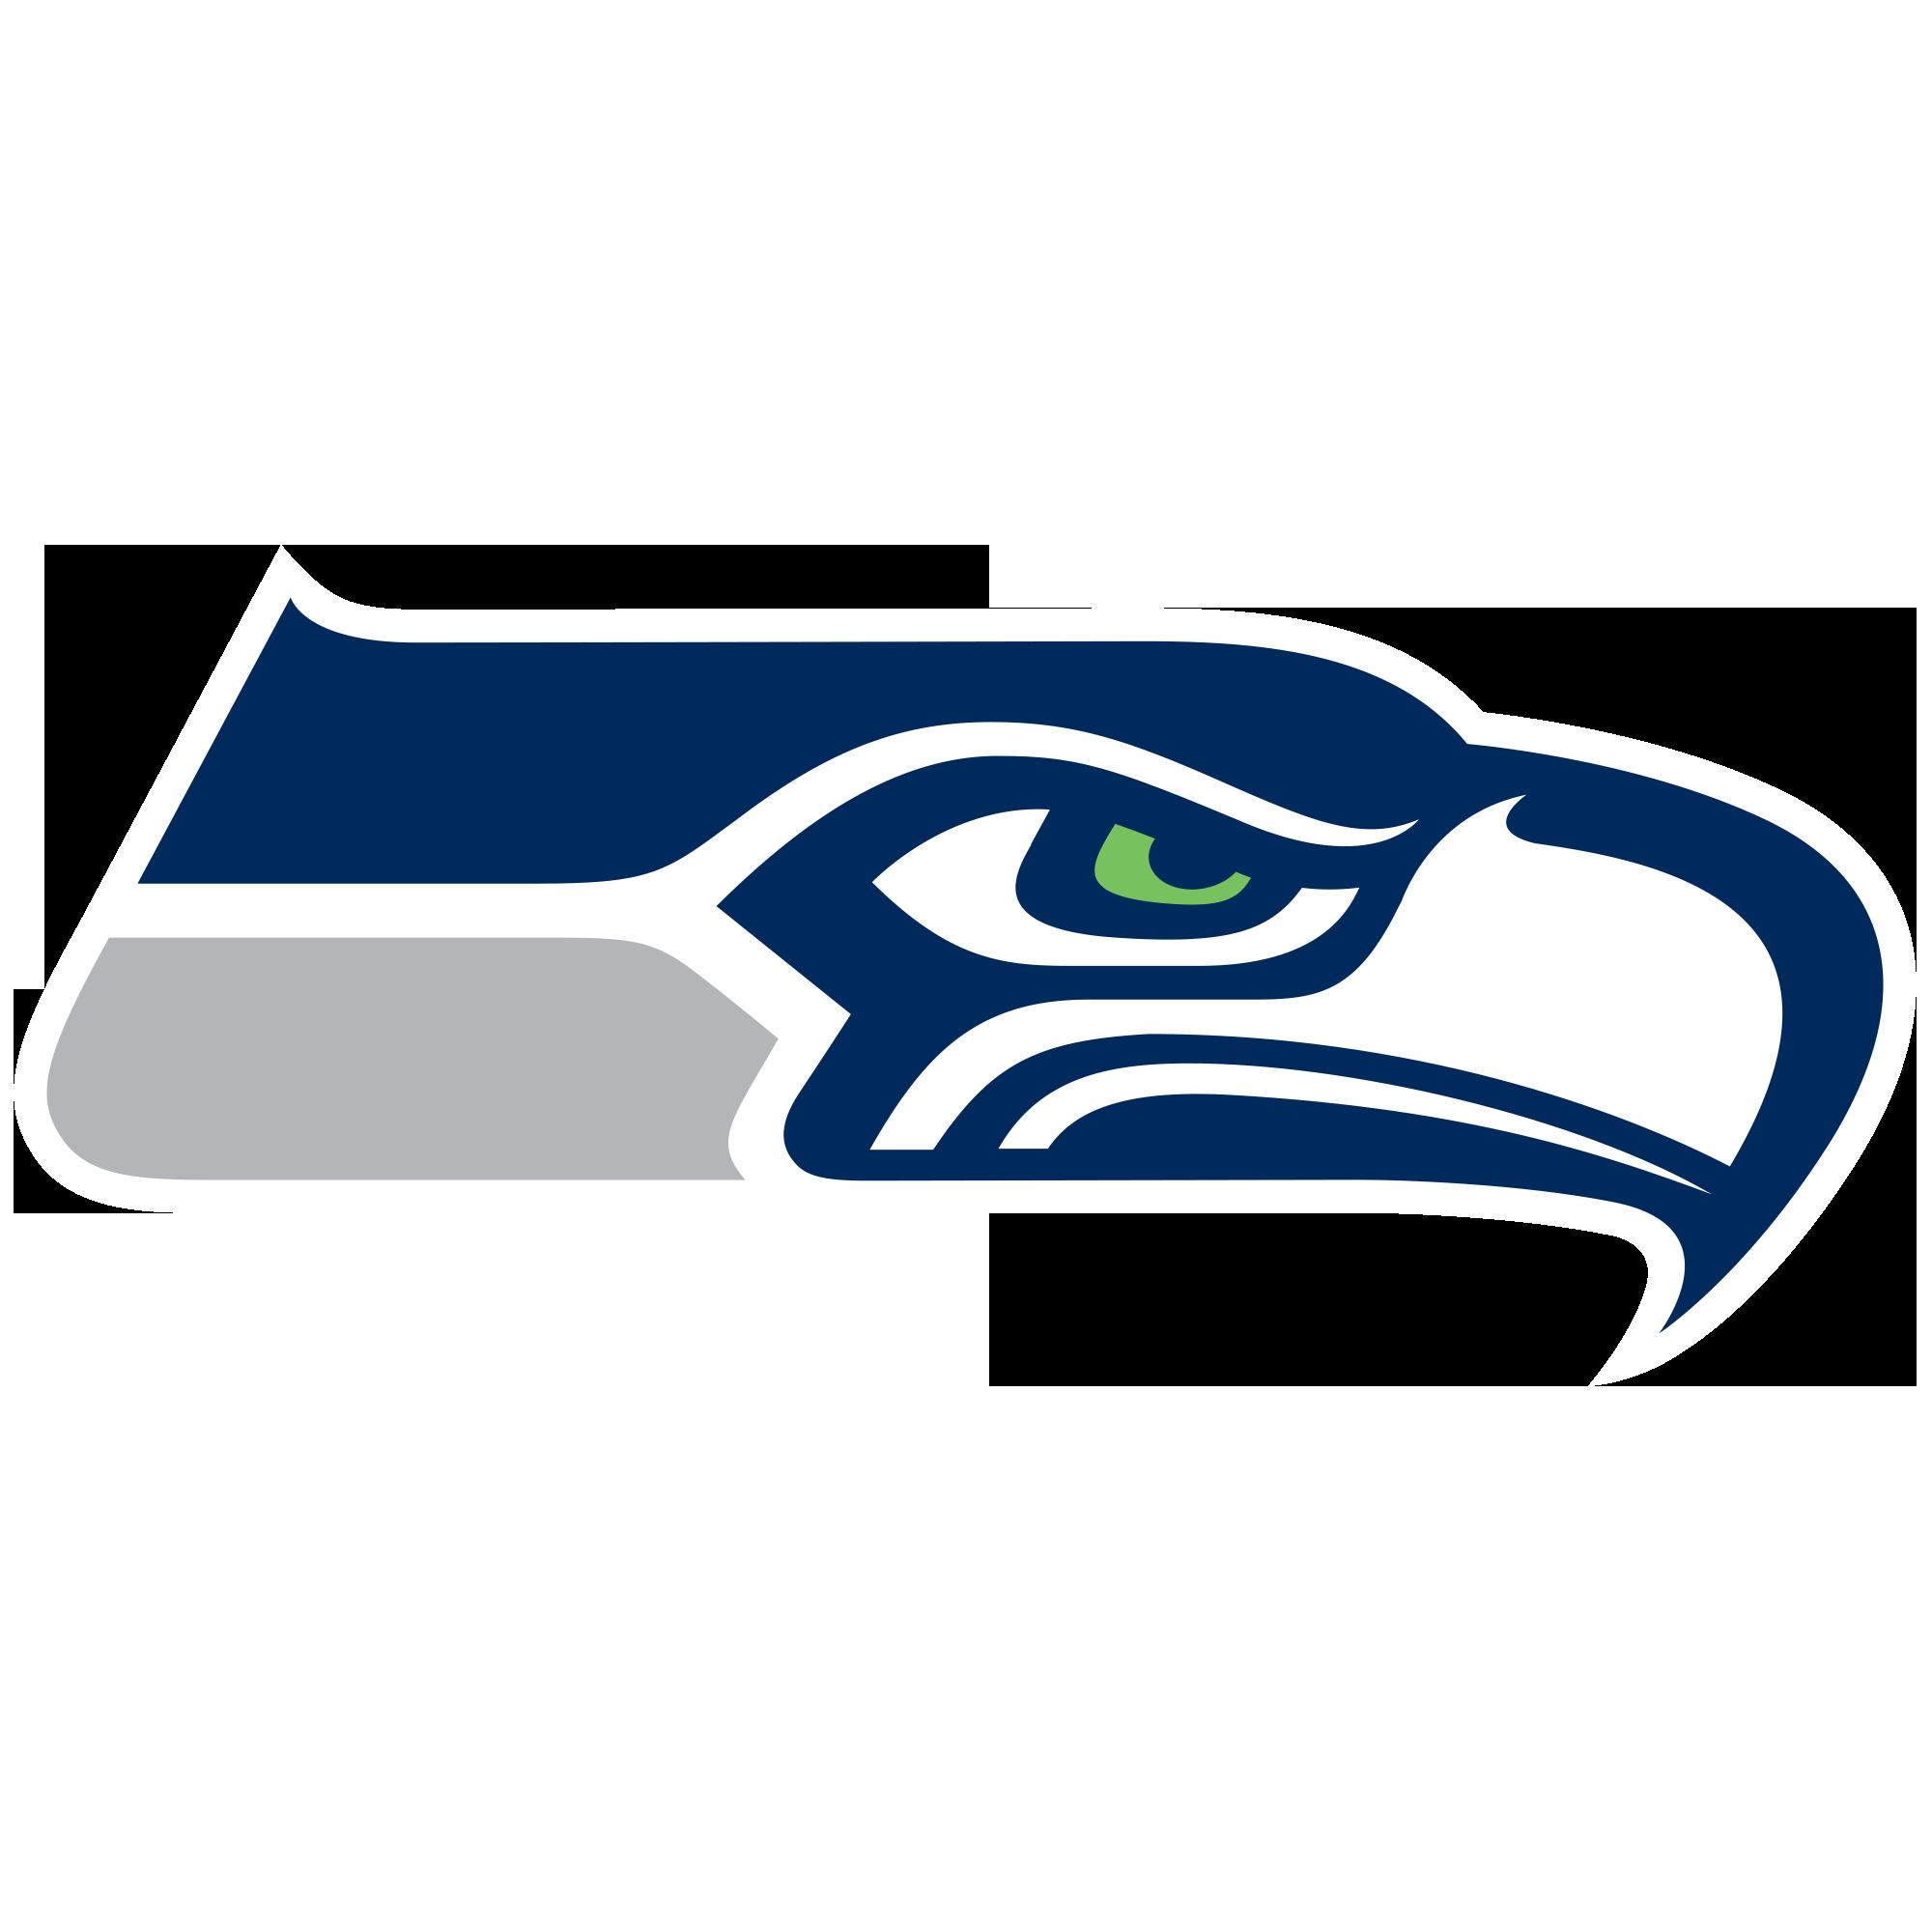 Seattle football field clipart jpg royalty free download Seattle Seahawks – South Bronx Saints jpg royalty free download